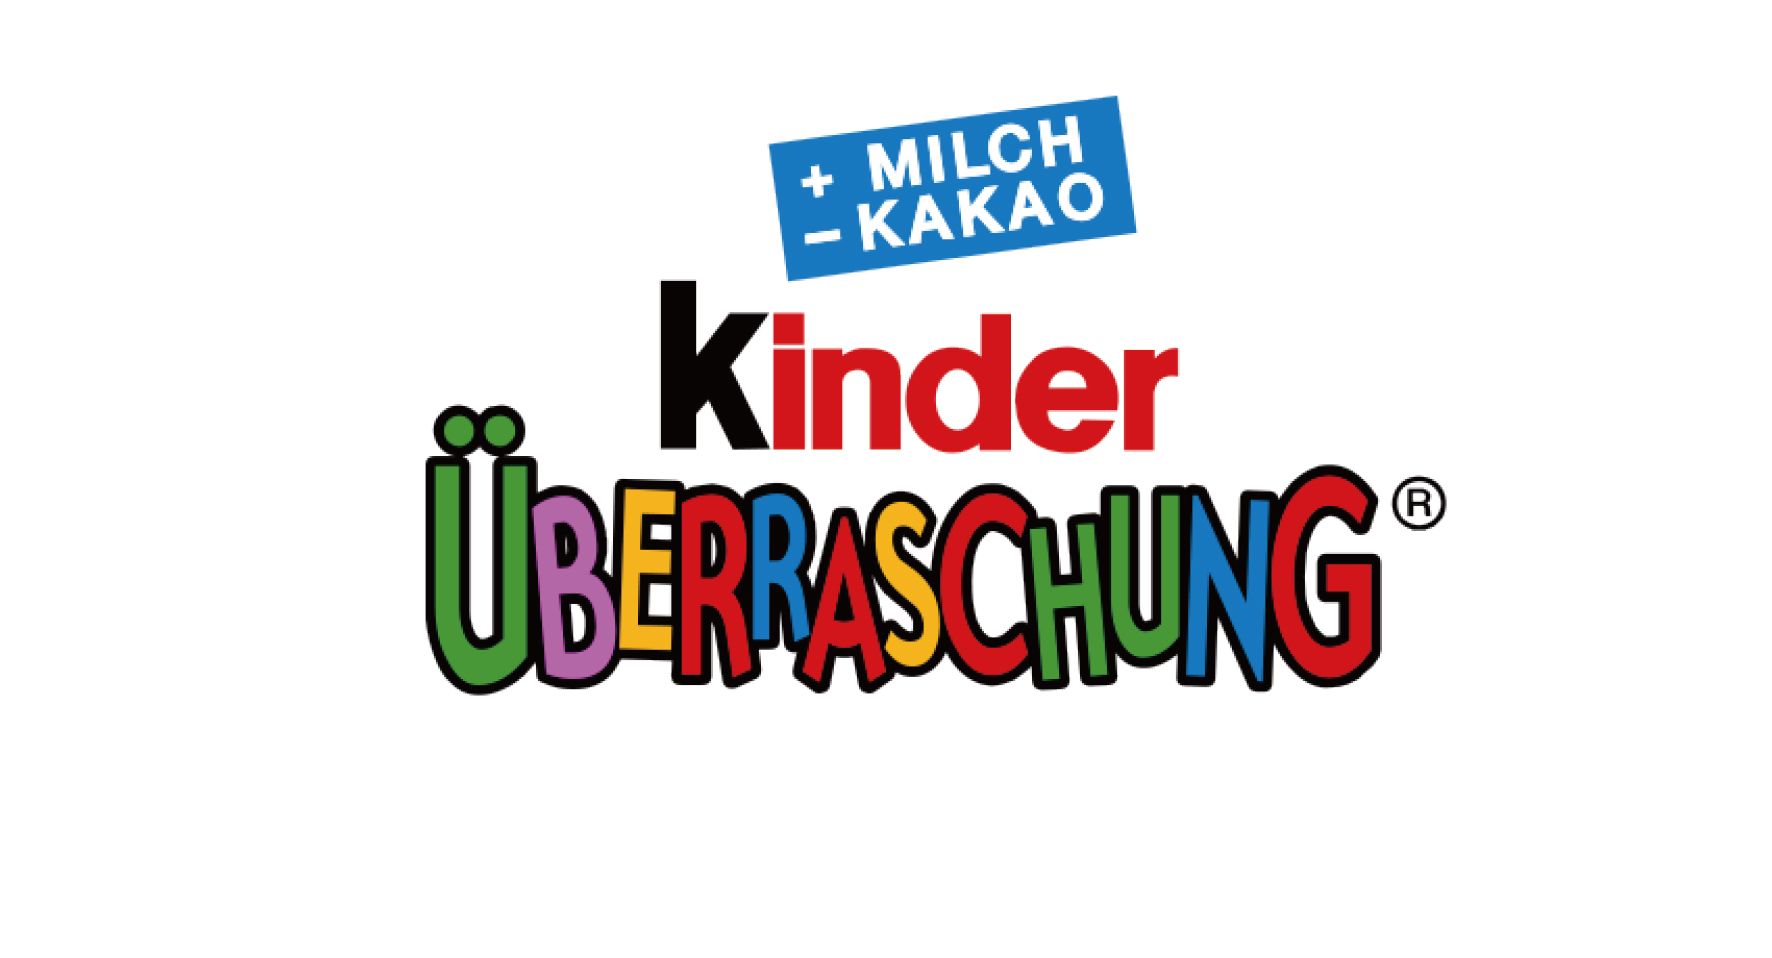 Kinder_Überraschung